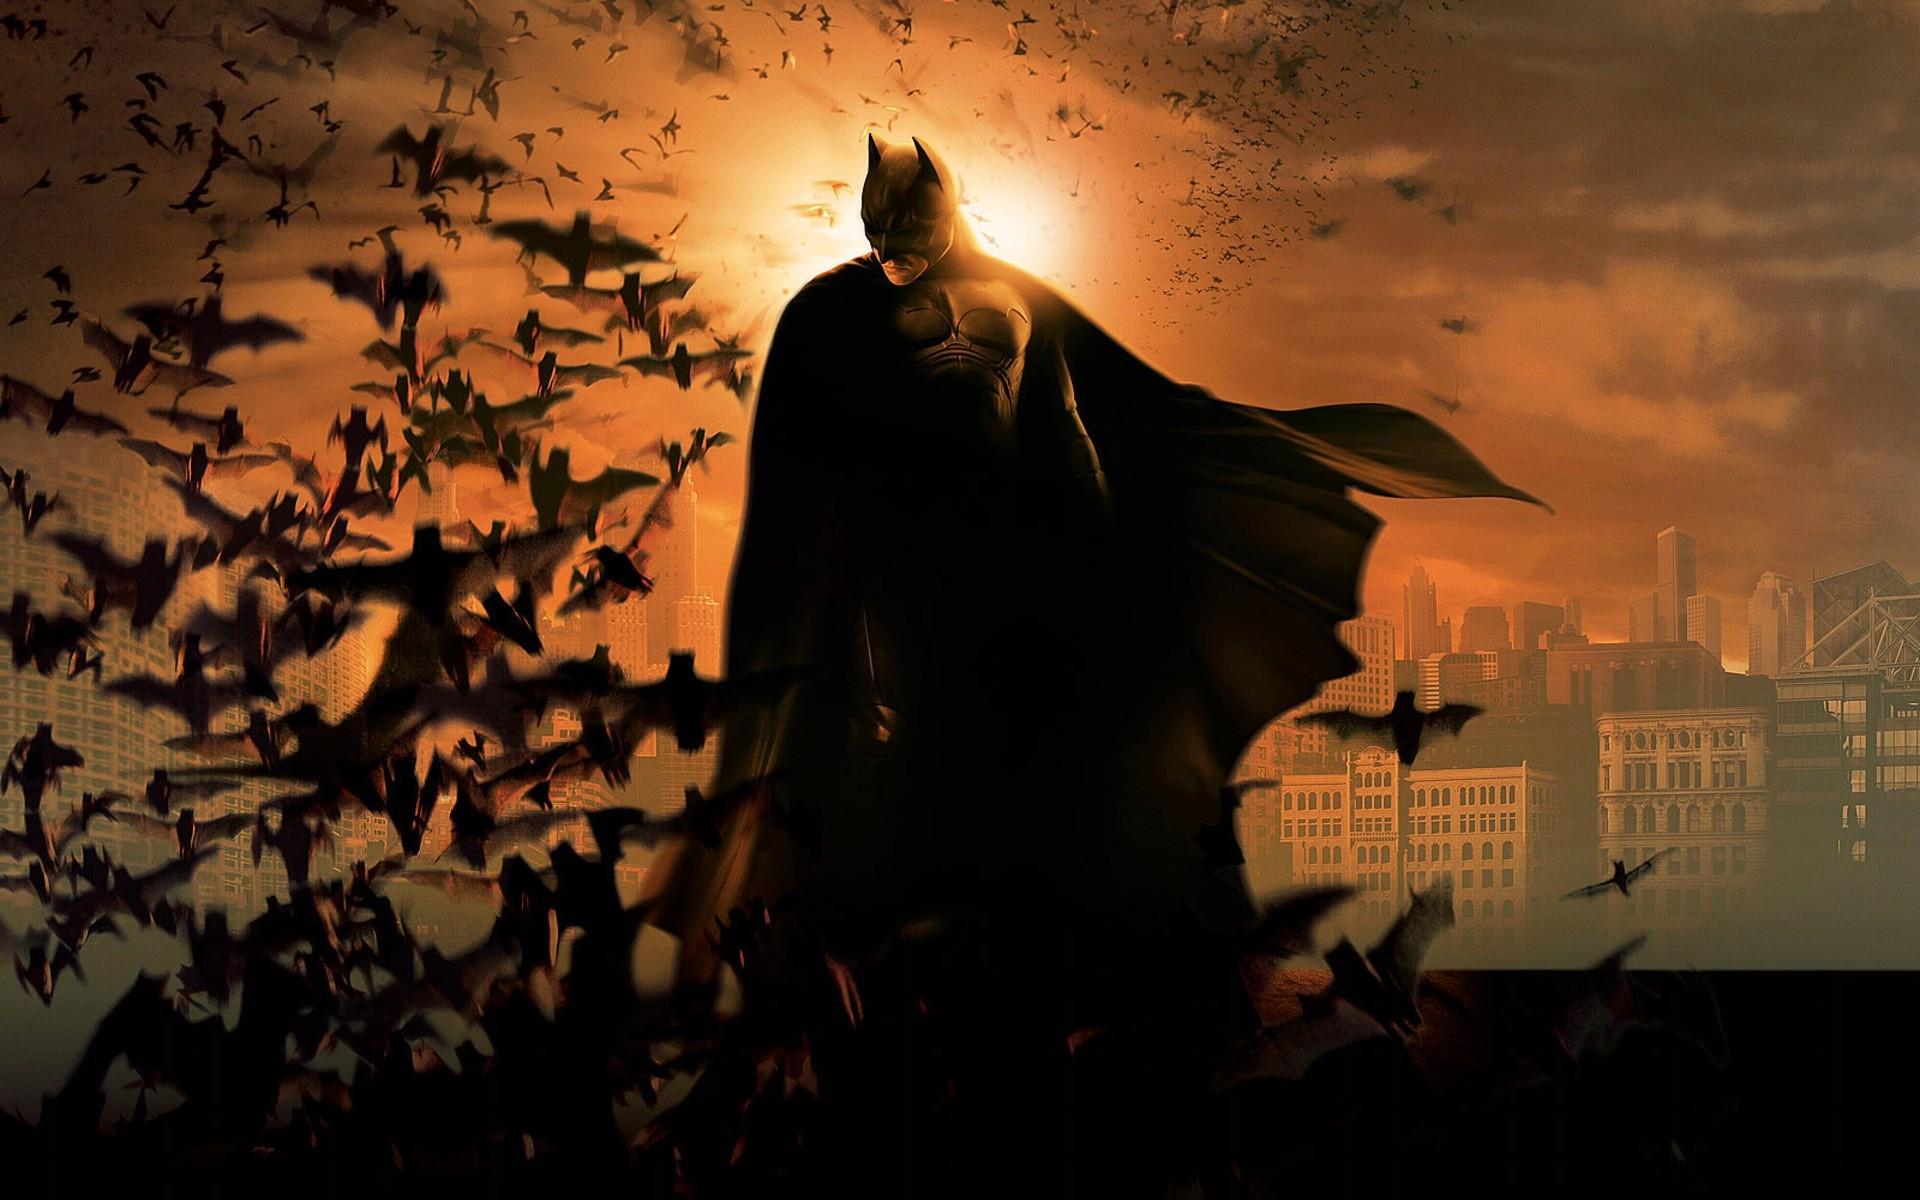 batman-dark-knight-rises-movies hd desktop wallpaper screensaver .